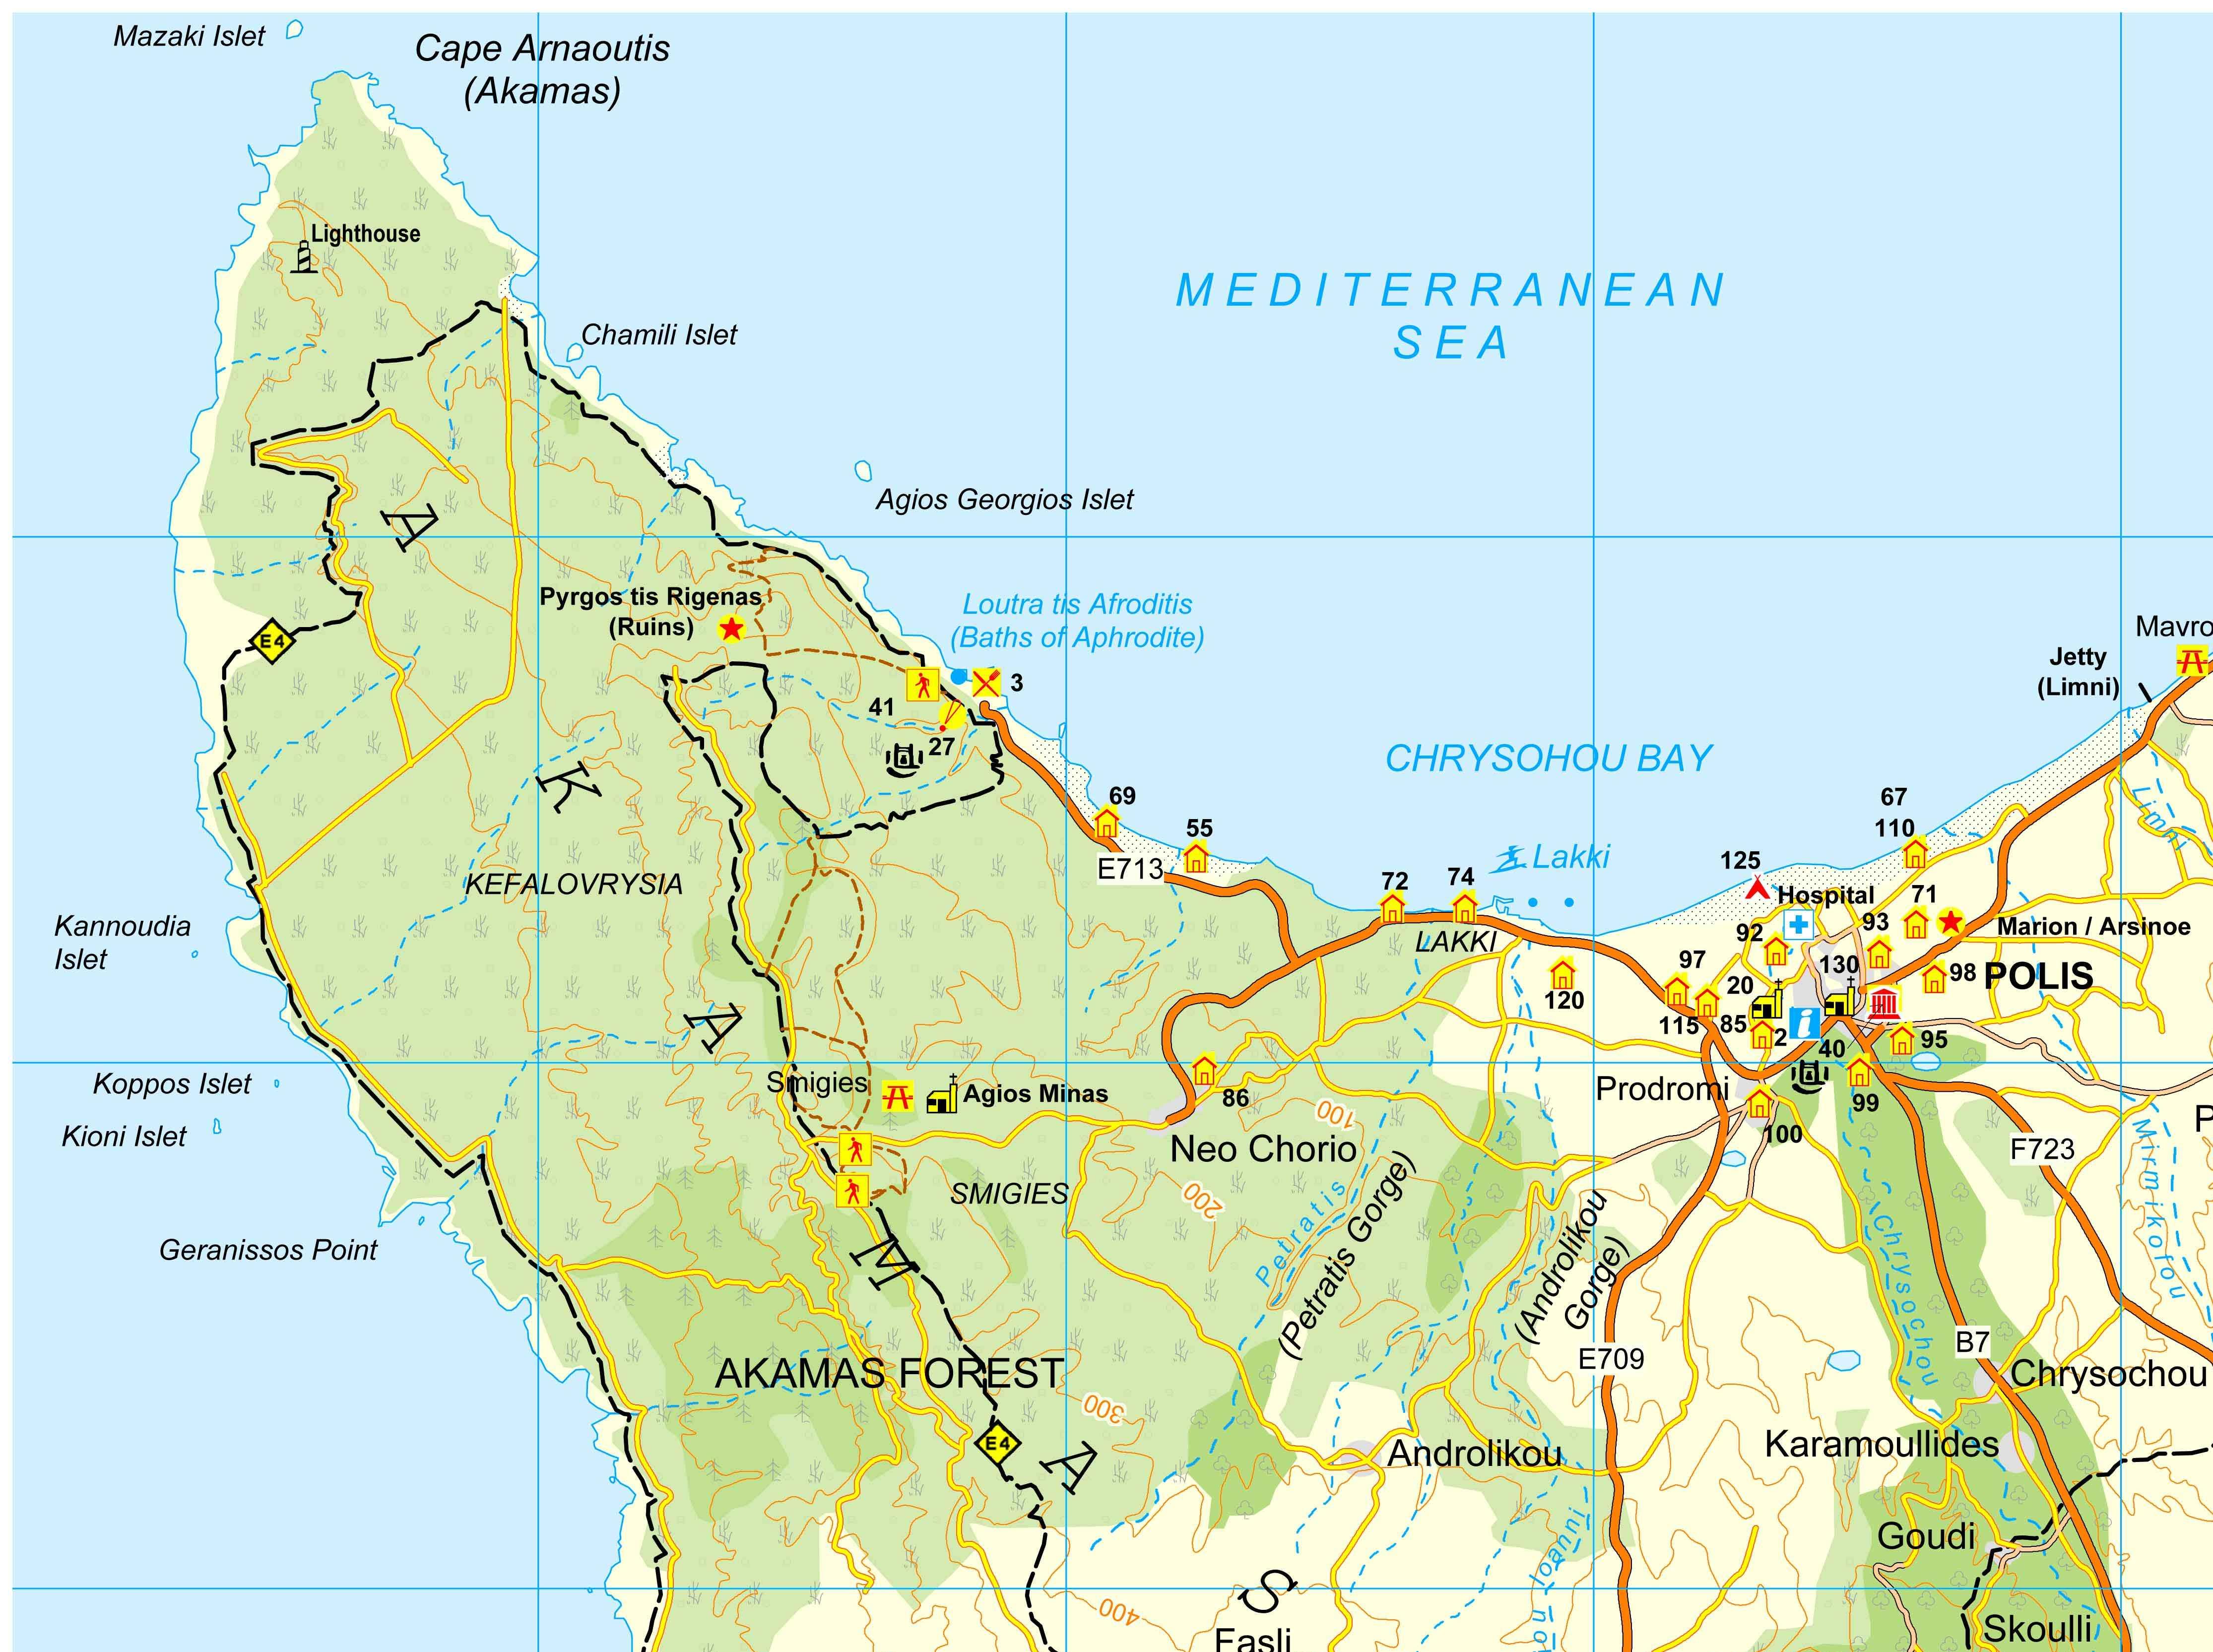 cyprus_akamas-peninsula-huge_kivagott.jpg